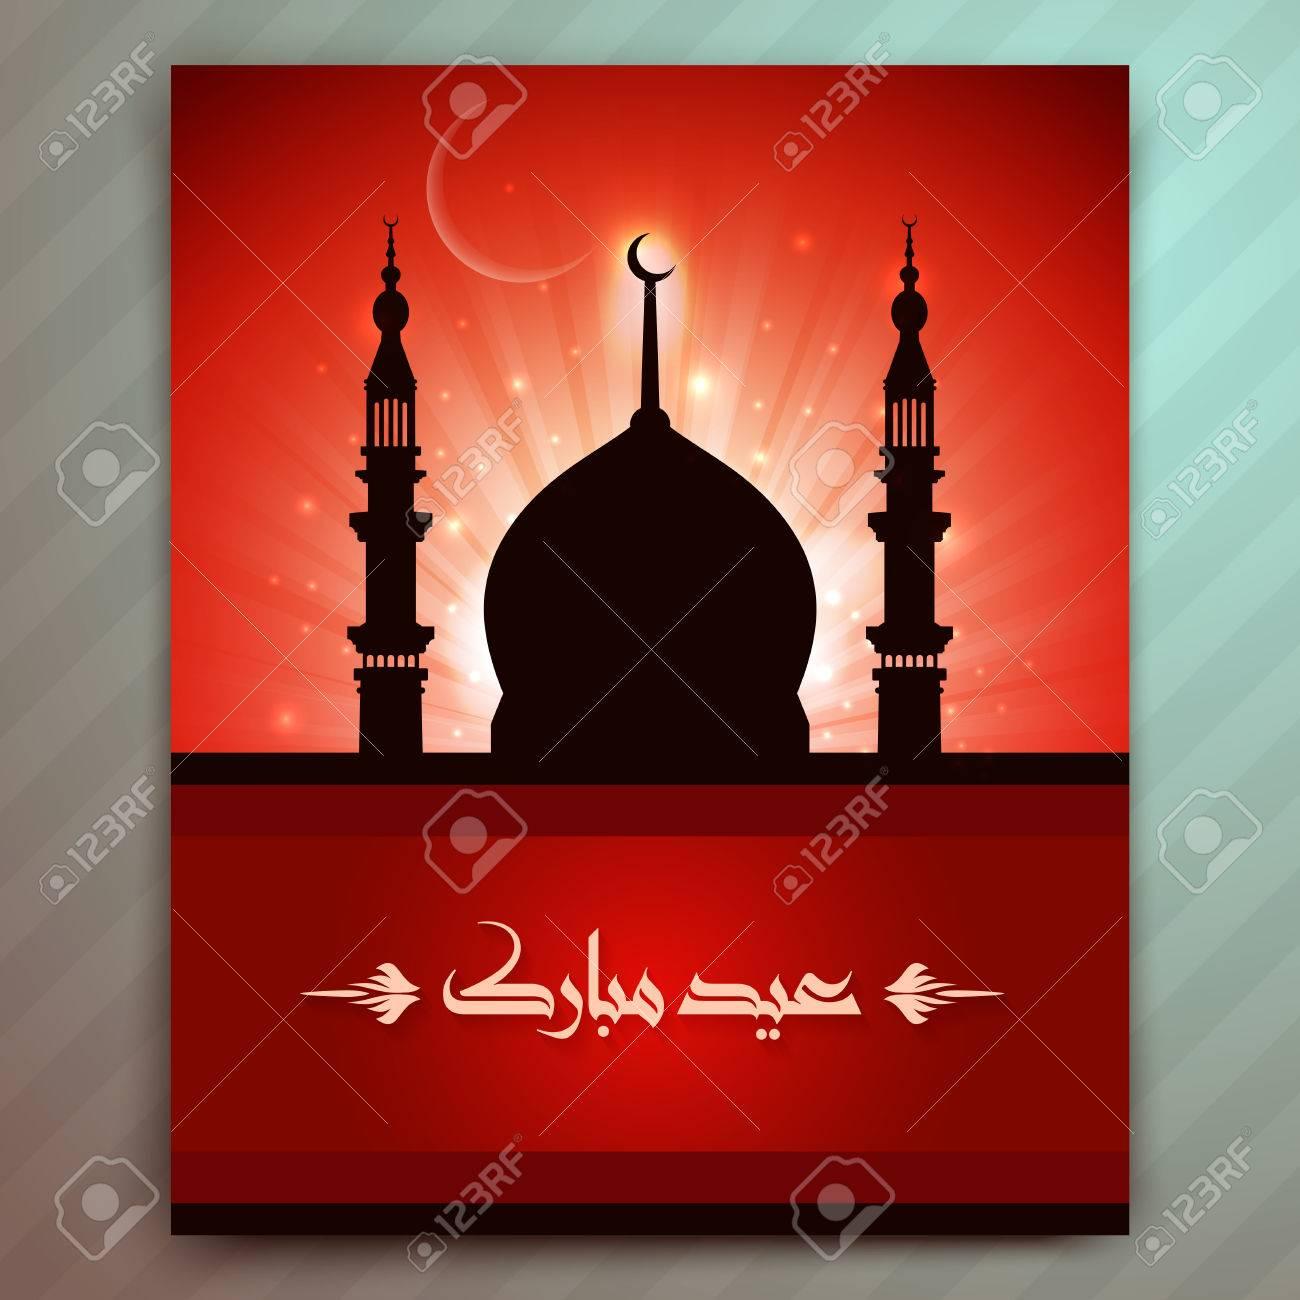 Eid Mubarak Islamic Event Eid Ul Fitr Royalty Free Cliparts